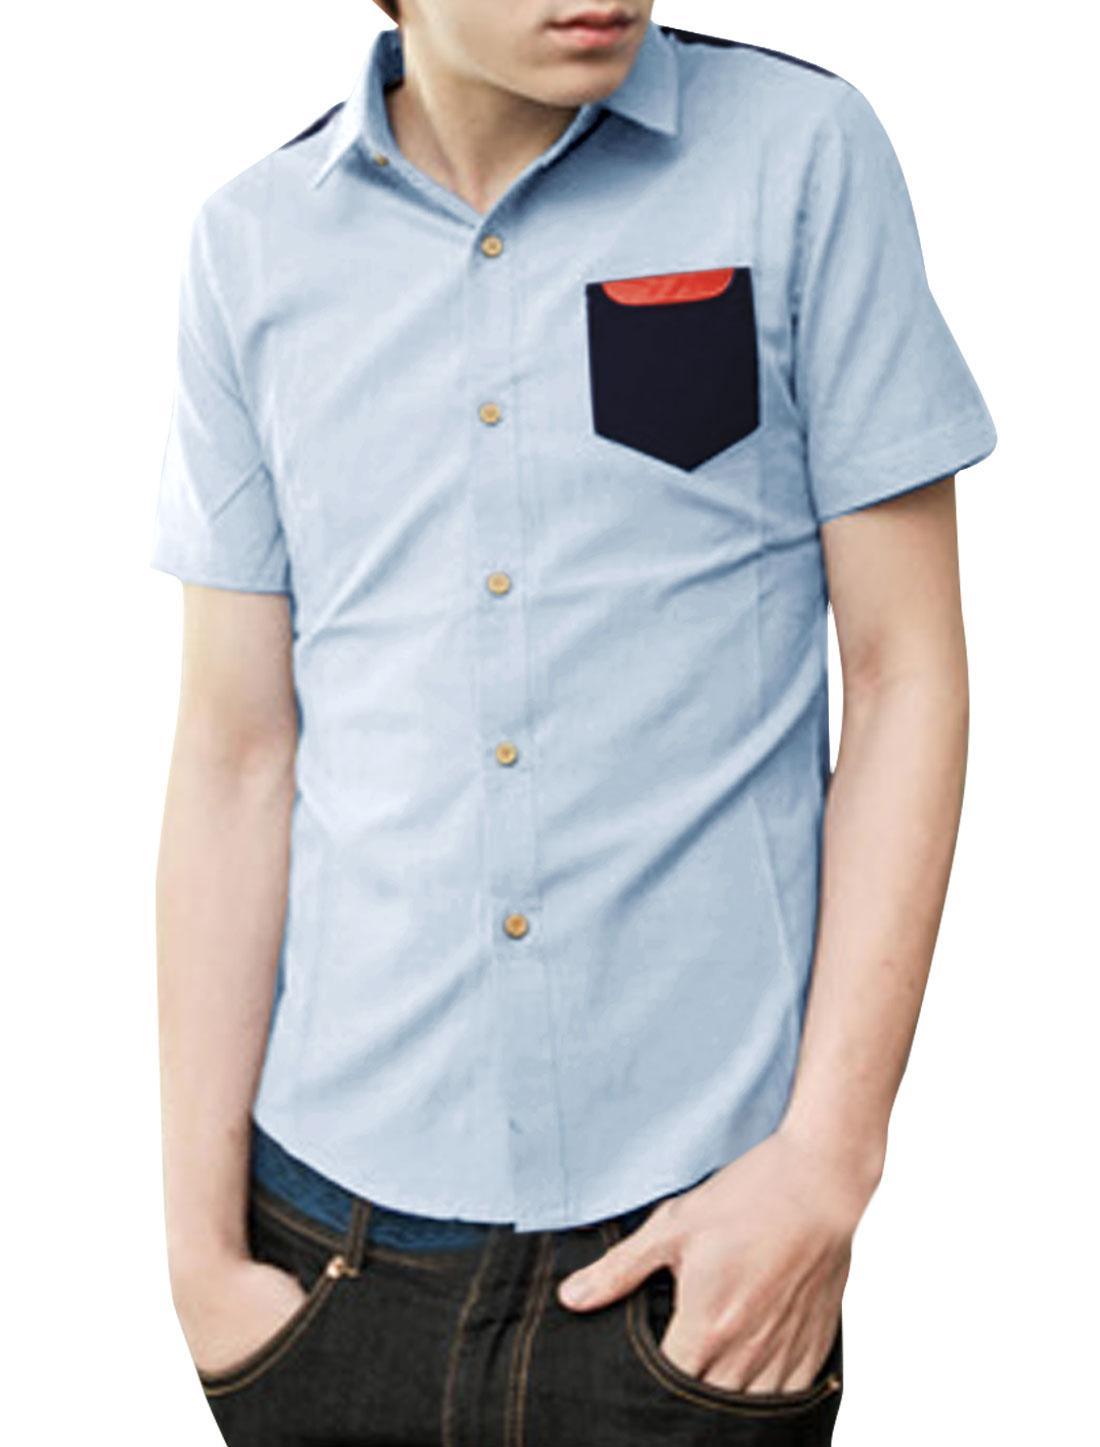 Mens Chic Point Collar Short Sleeve Splice Button Down Light Blue Shirt M